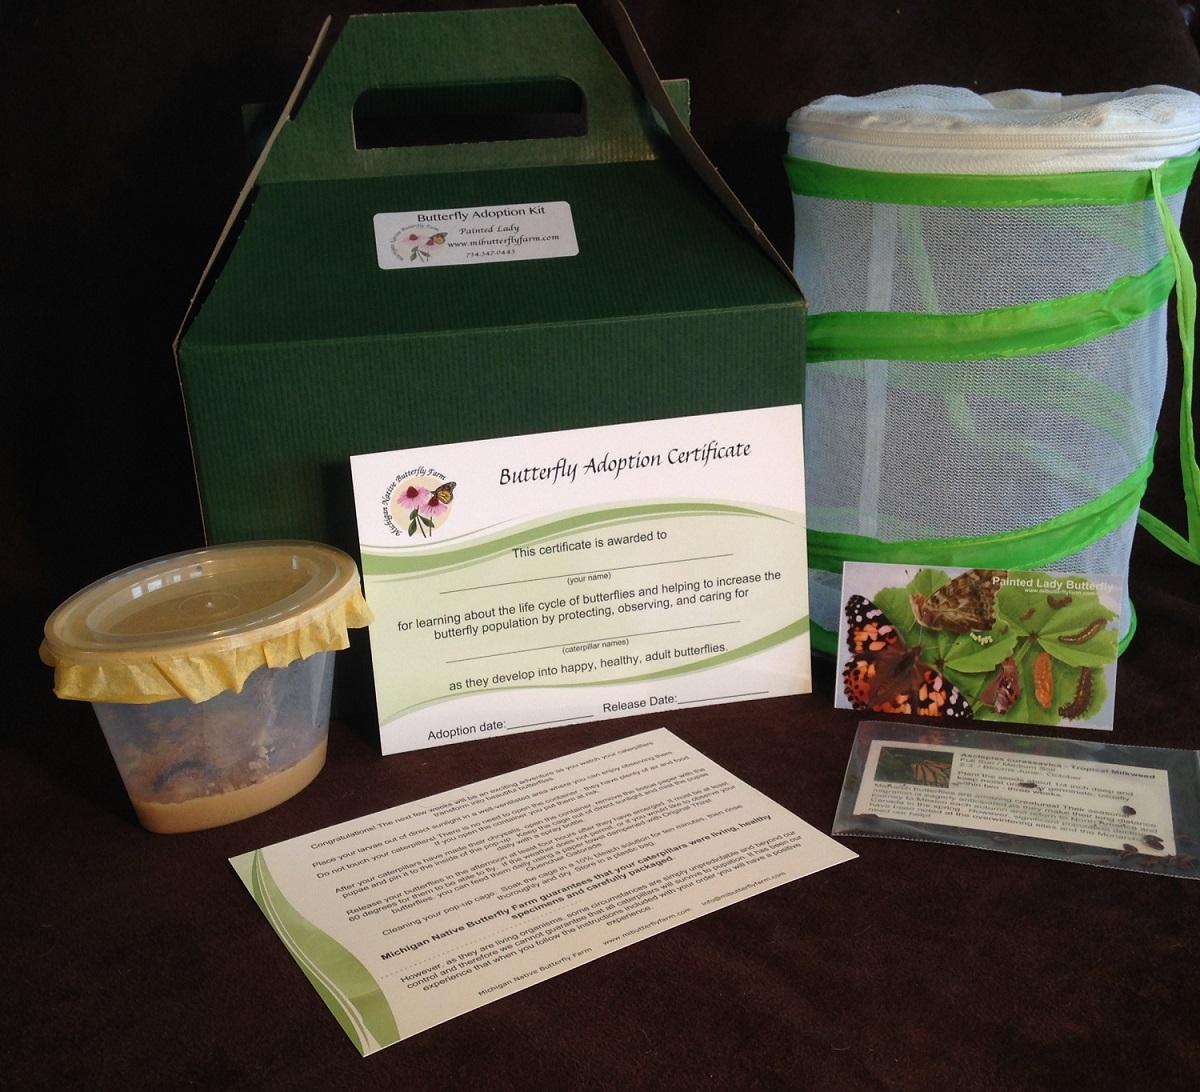 Butterfly Adoption Kit